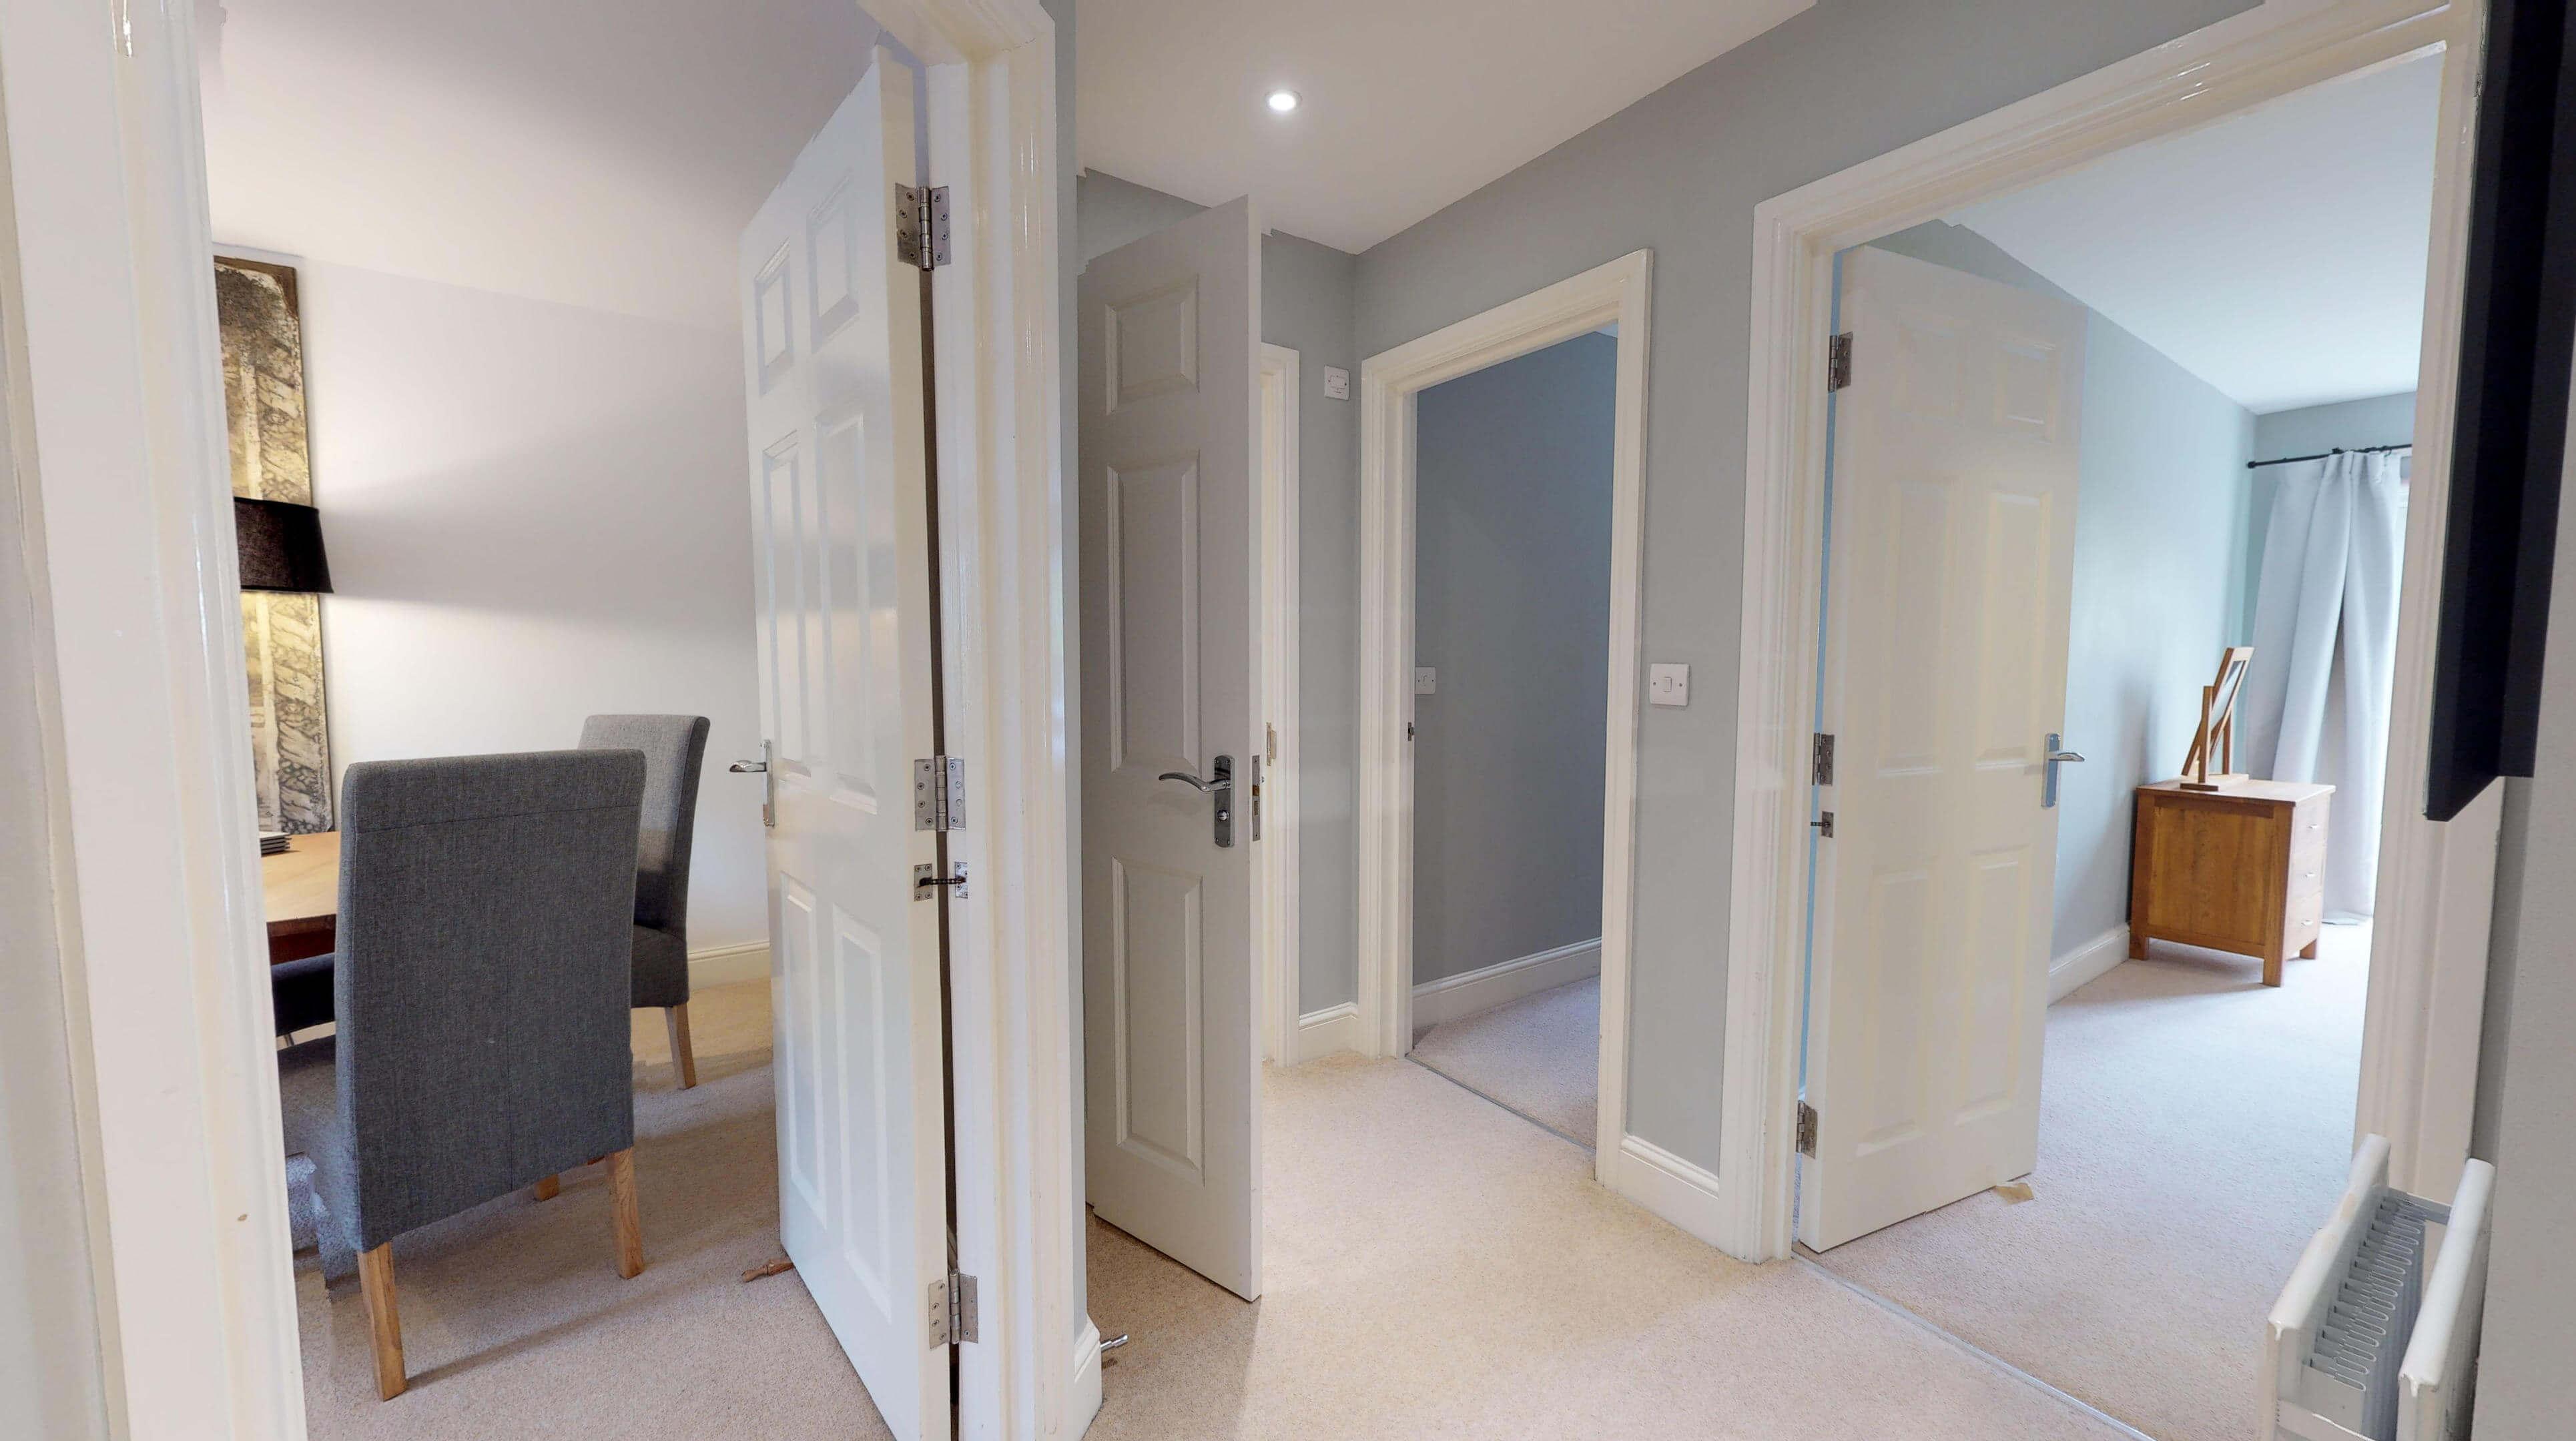 Oxford Serviced Apartments Hensington Suite Hallway View